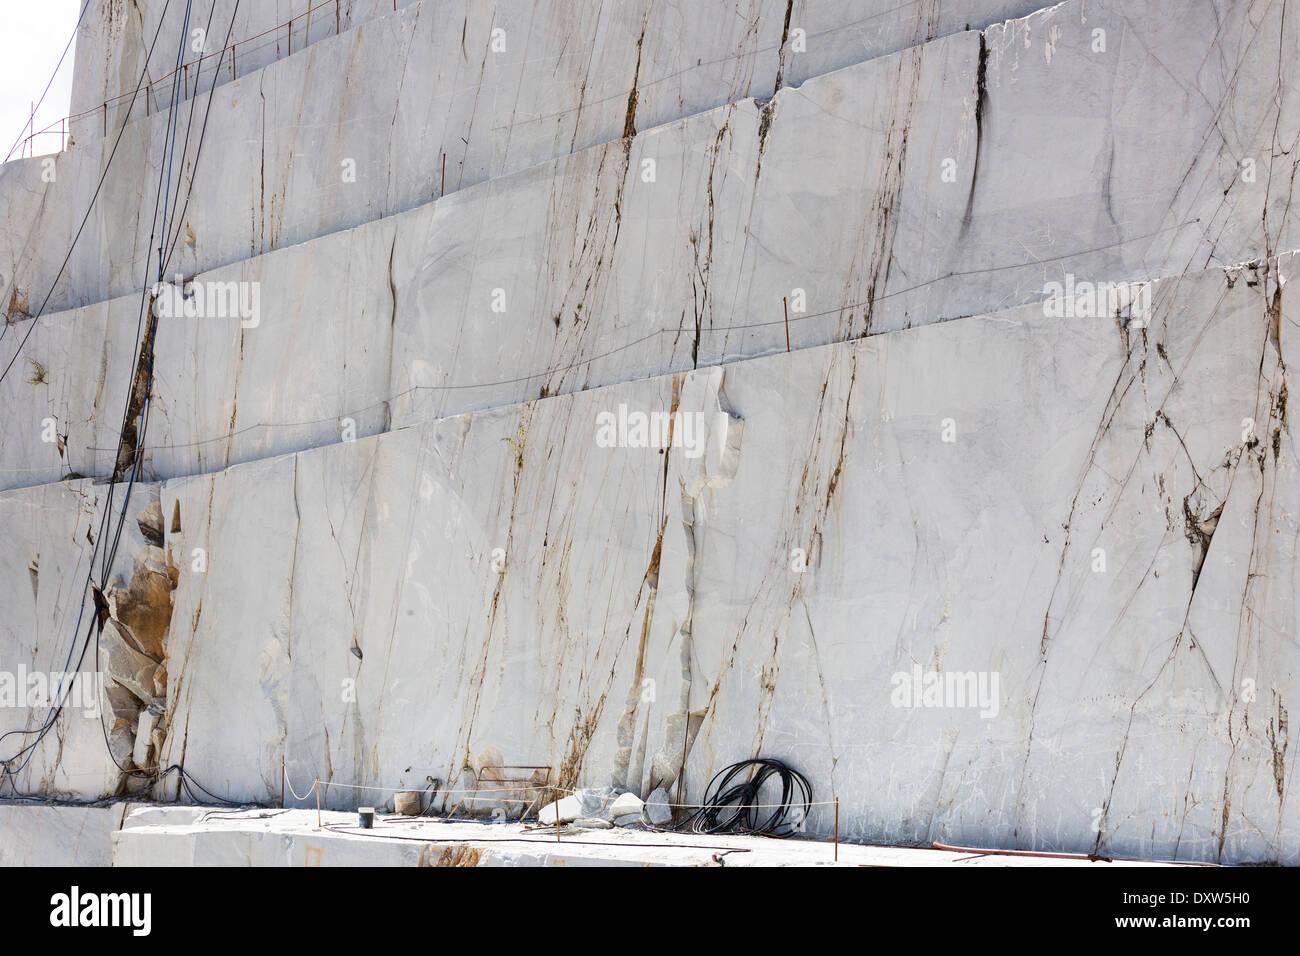 Cantera de mármol en los Alpes Apuanos, cerca de Carrara, Italia Foto de stock